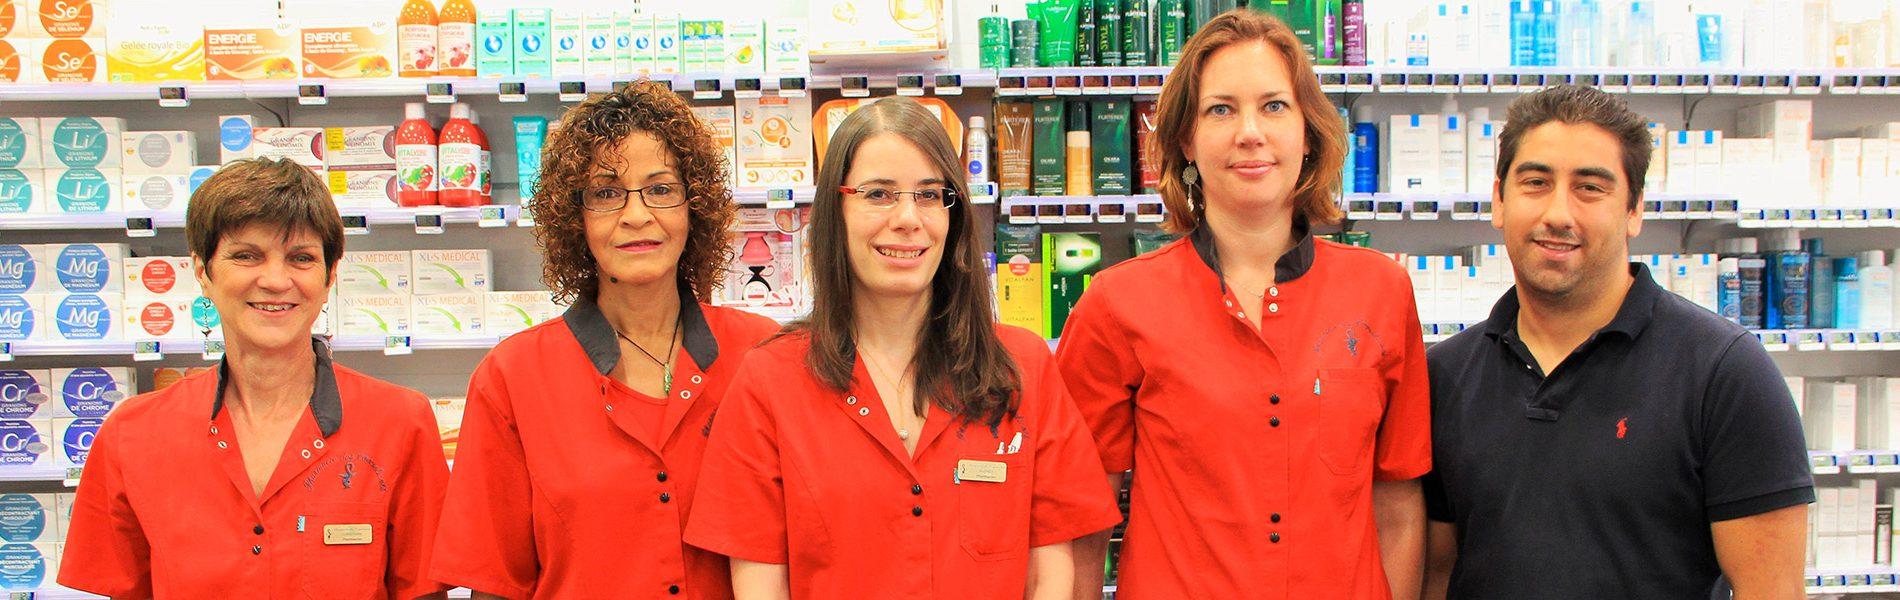 Pharmacie DES COQUELICOTS - Image Homepage 3